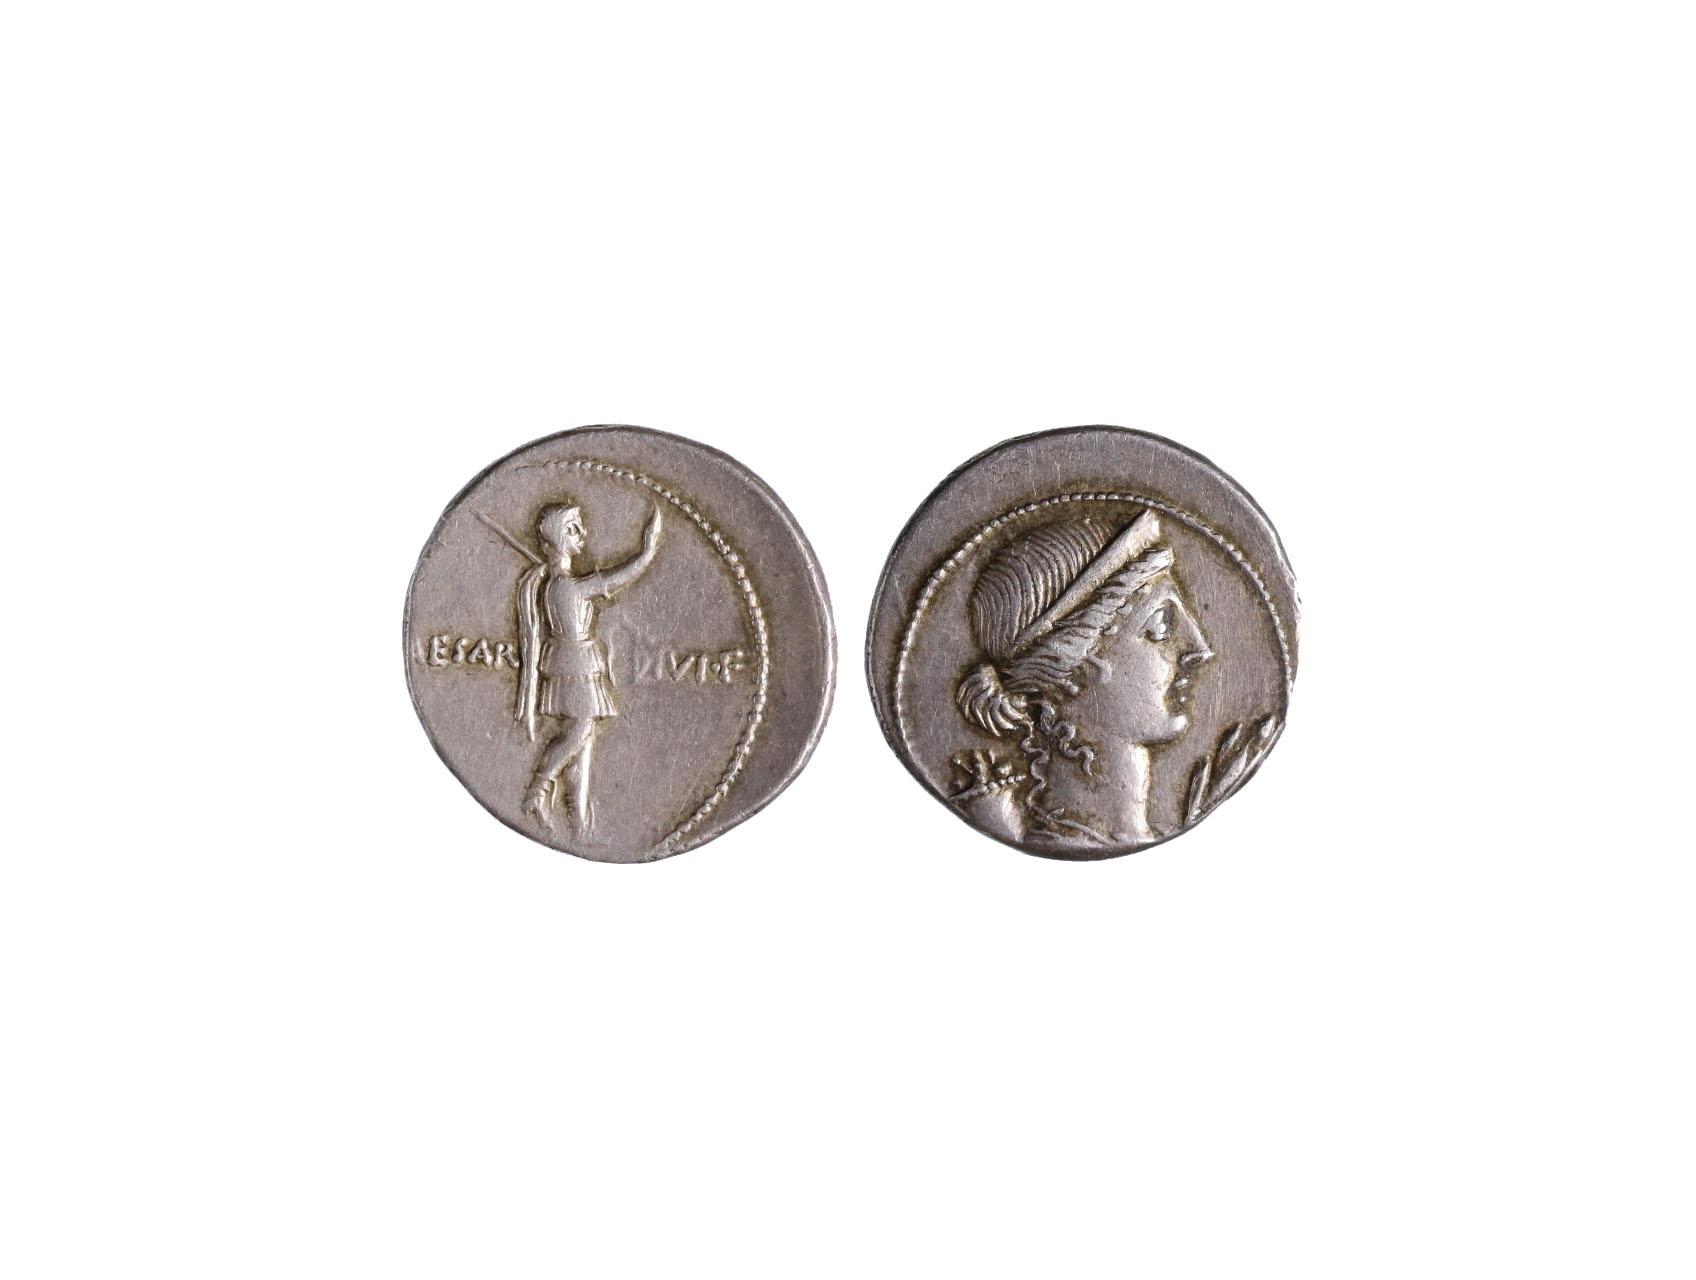 Řím císařství, Octavian Augustus 27př.n.l.-14 n.l. - Denár, Ric I. 253